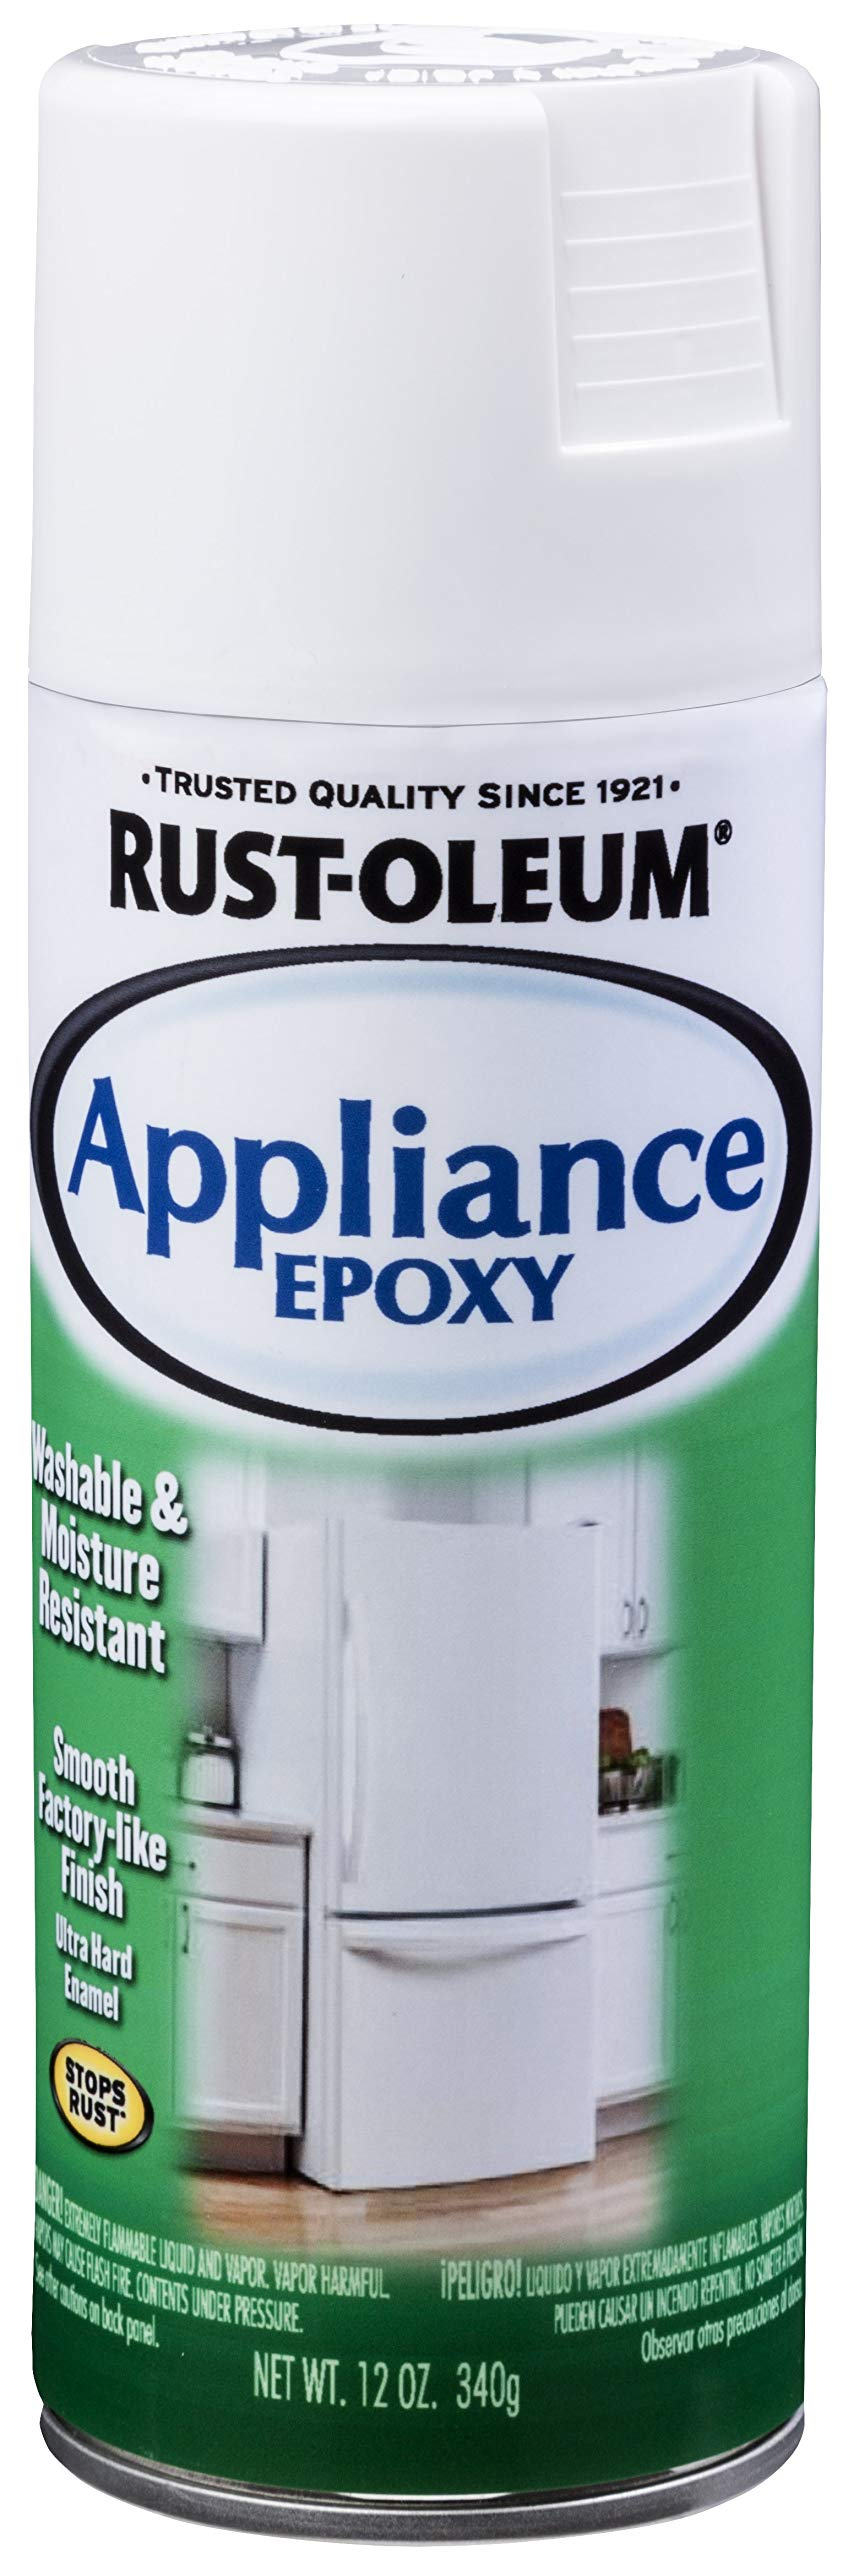 Rust-Oleum 7881830 7881-830 Appliance Epoxy, 12 oz, White